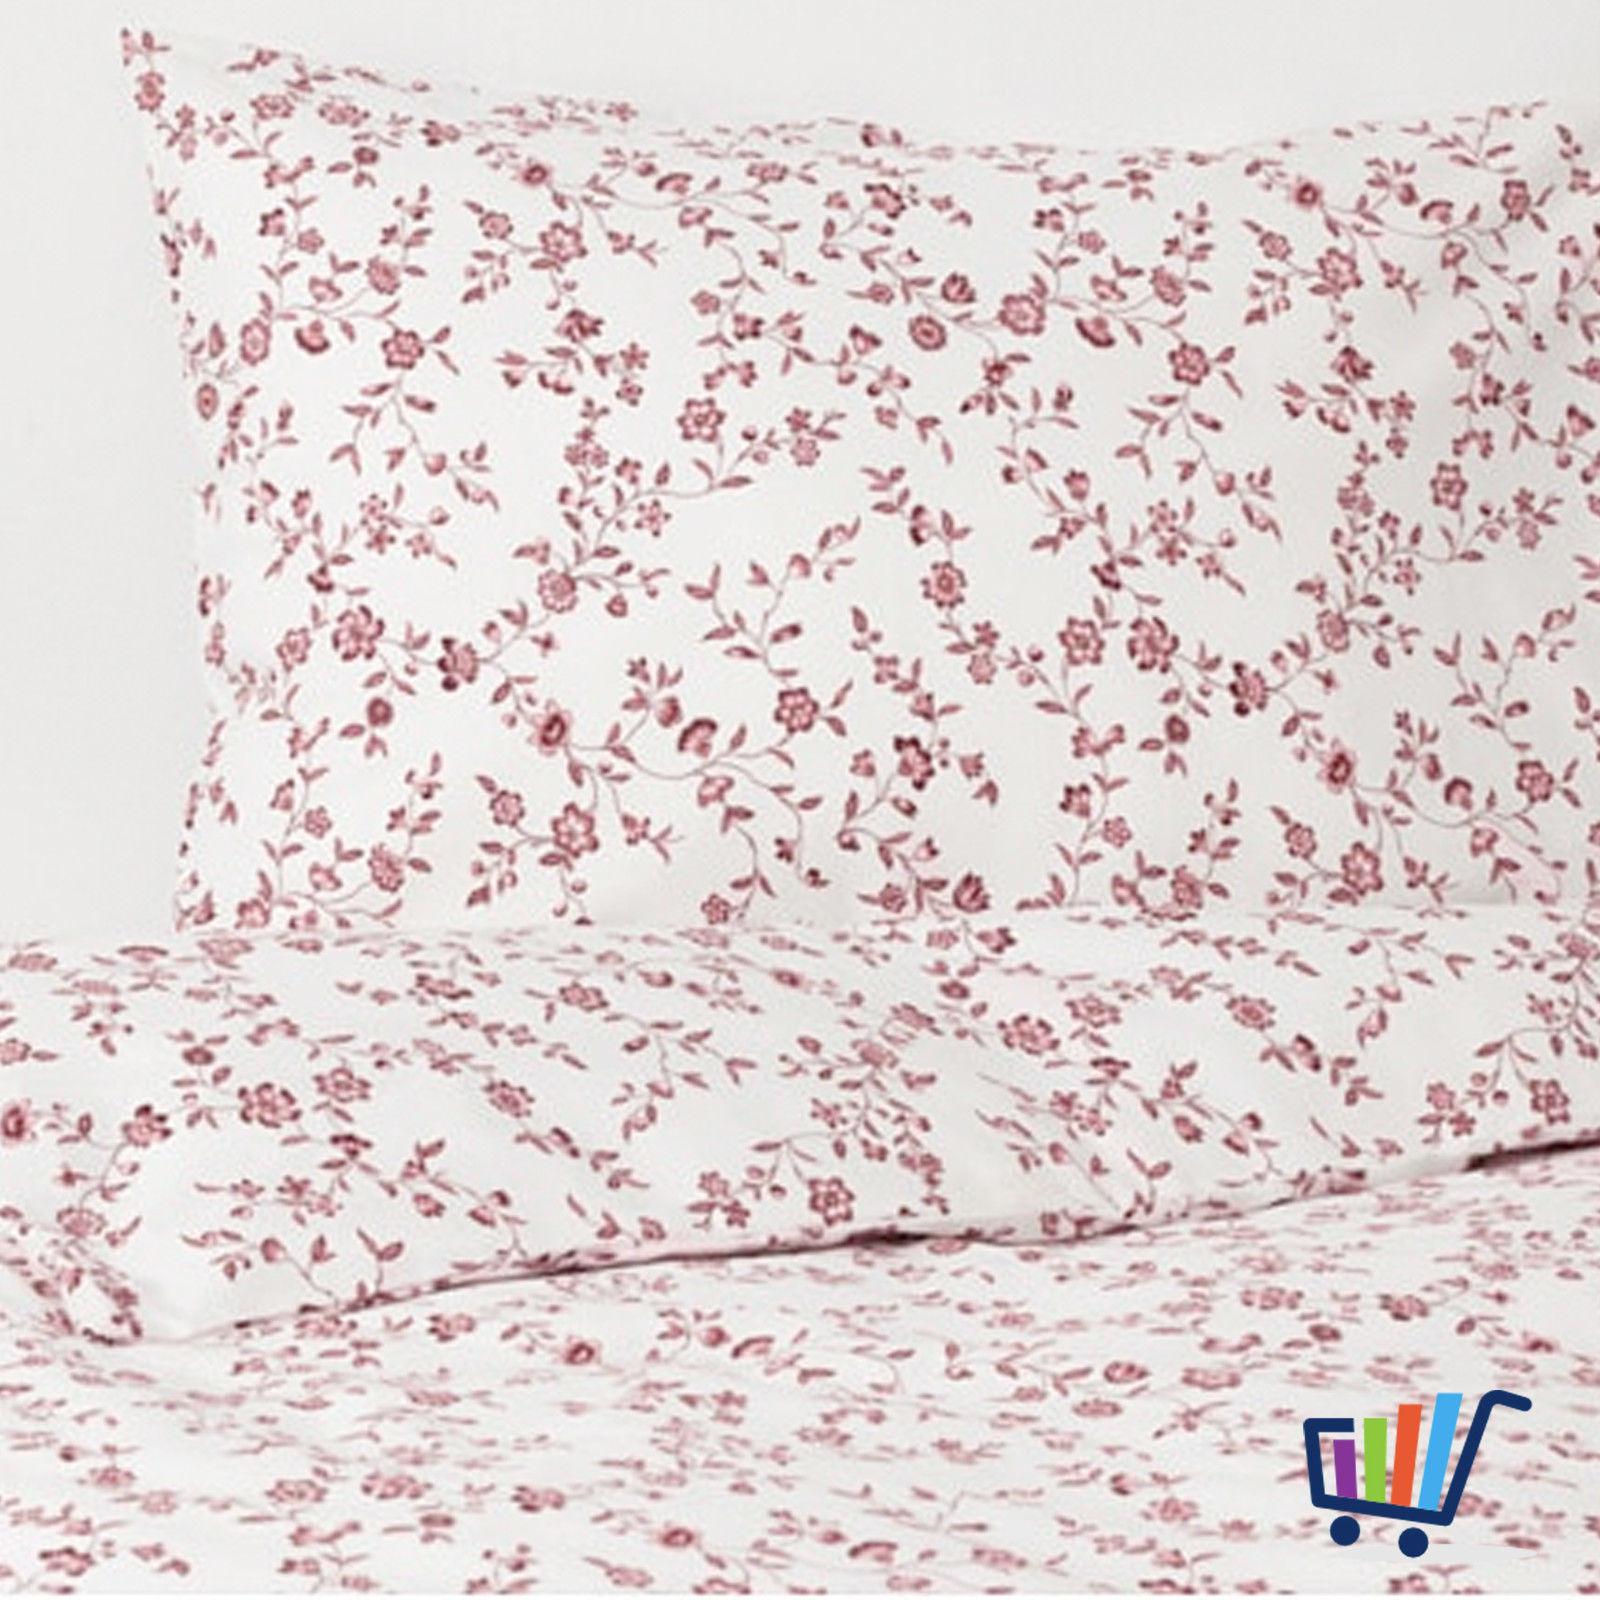 Ikea Hässleklocka 2 Tlg Bettwäsche 140200 Cm Bettbezug Rosa Weiß